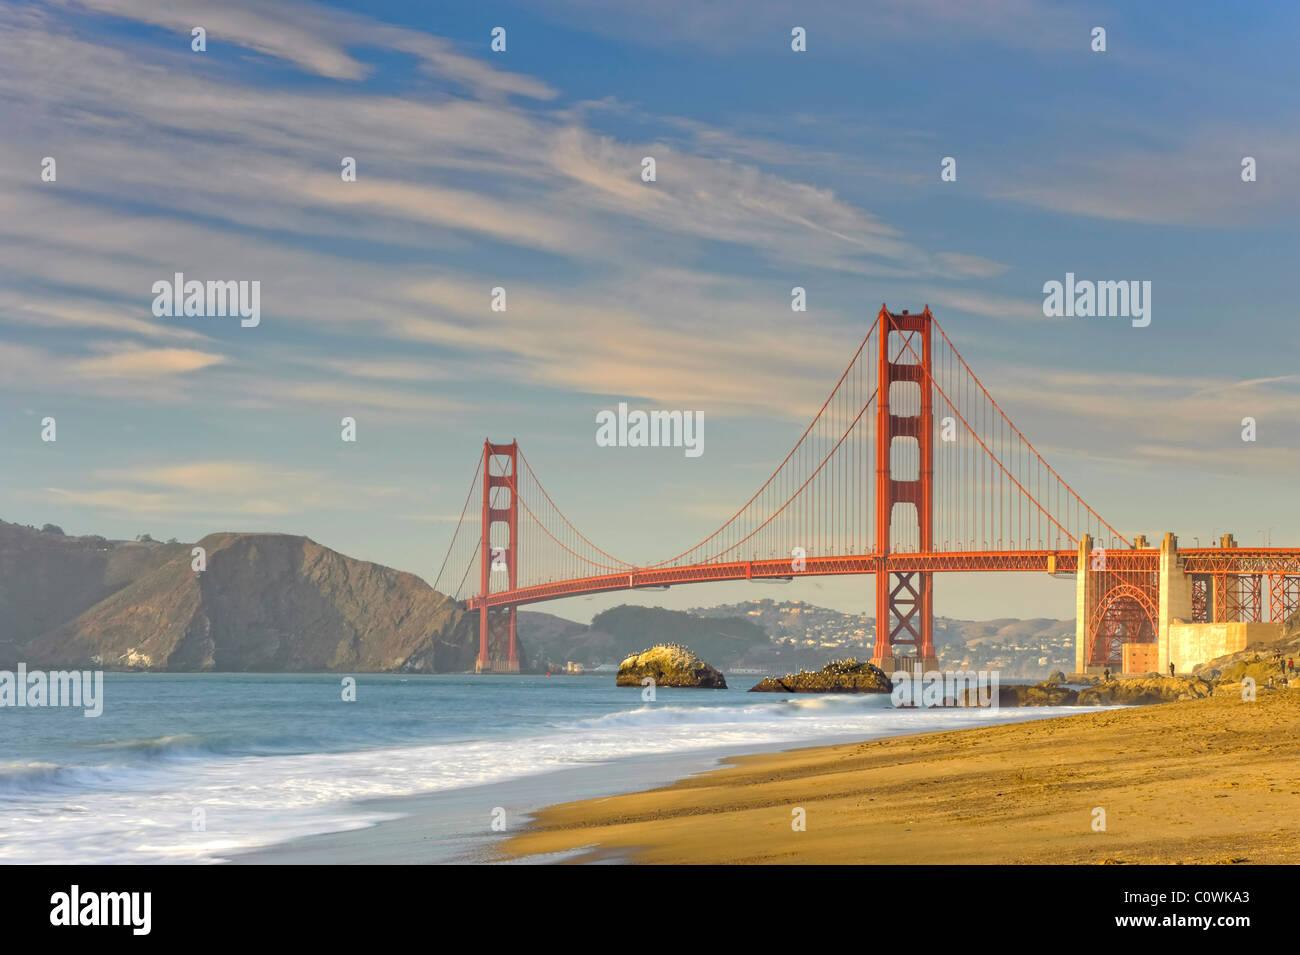 USA, California, San Francisco, Baker Beach und Golden Gate Bridge Stockbild